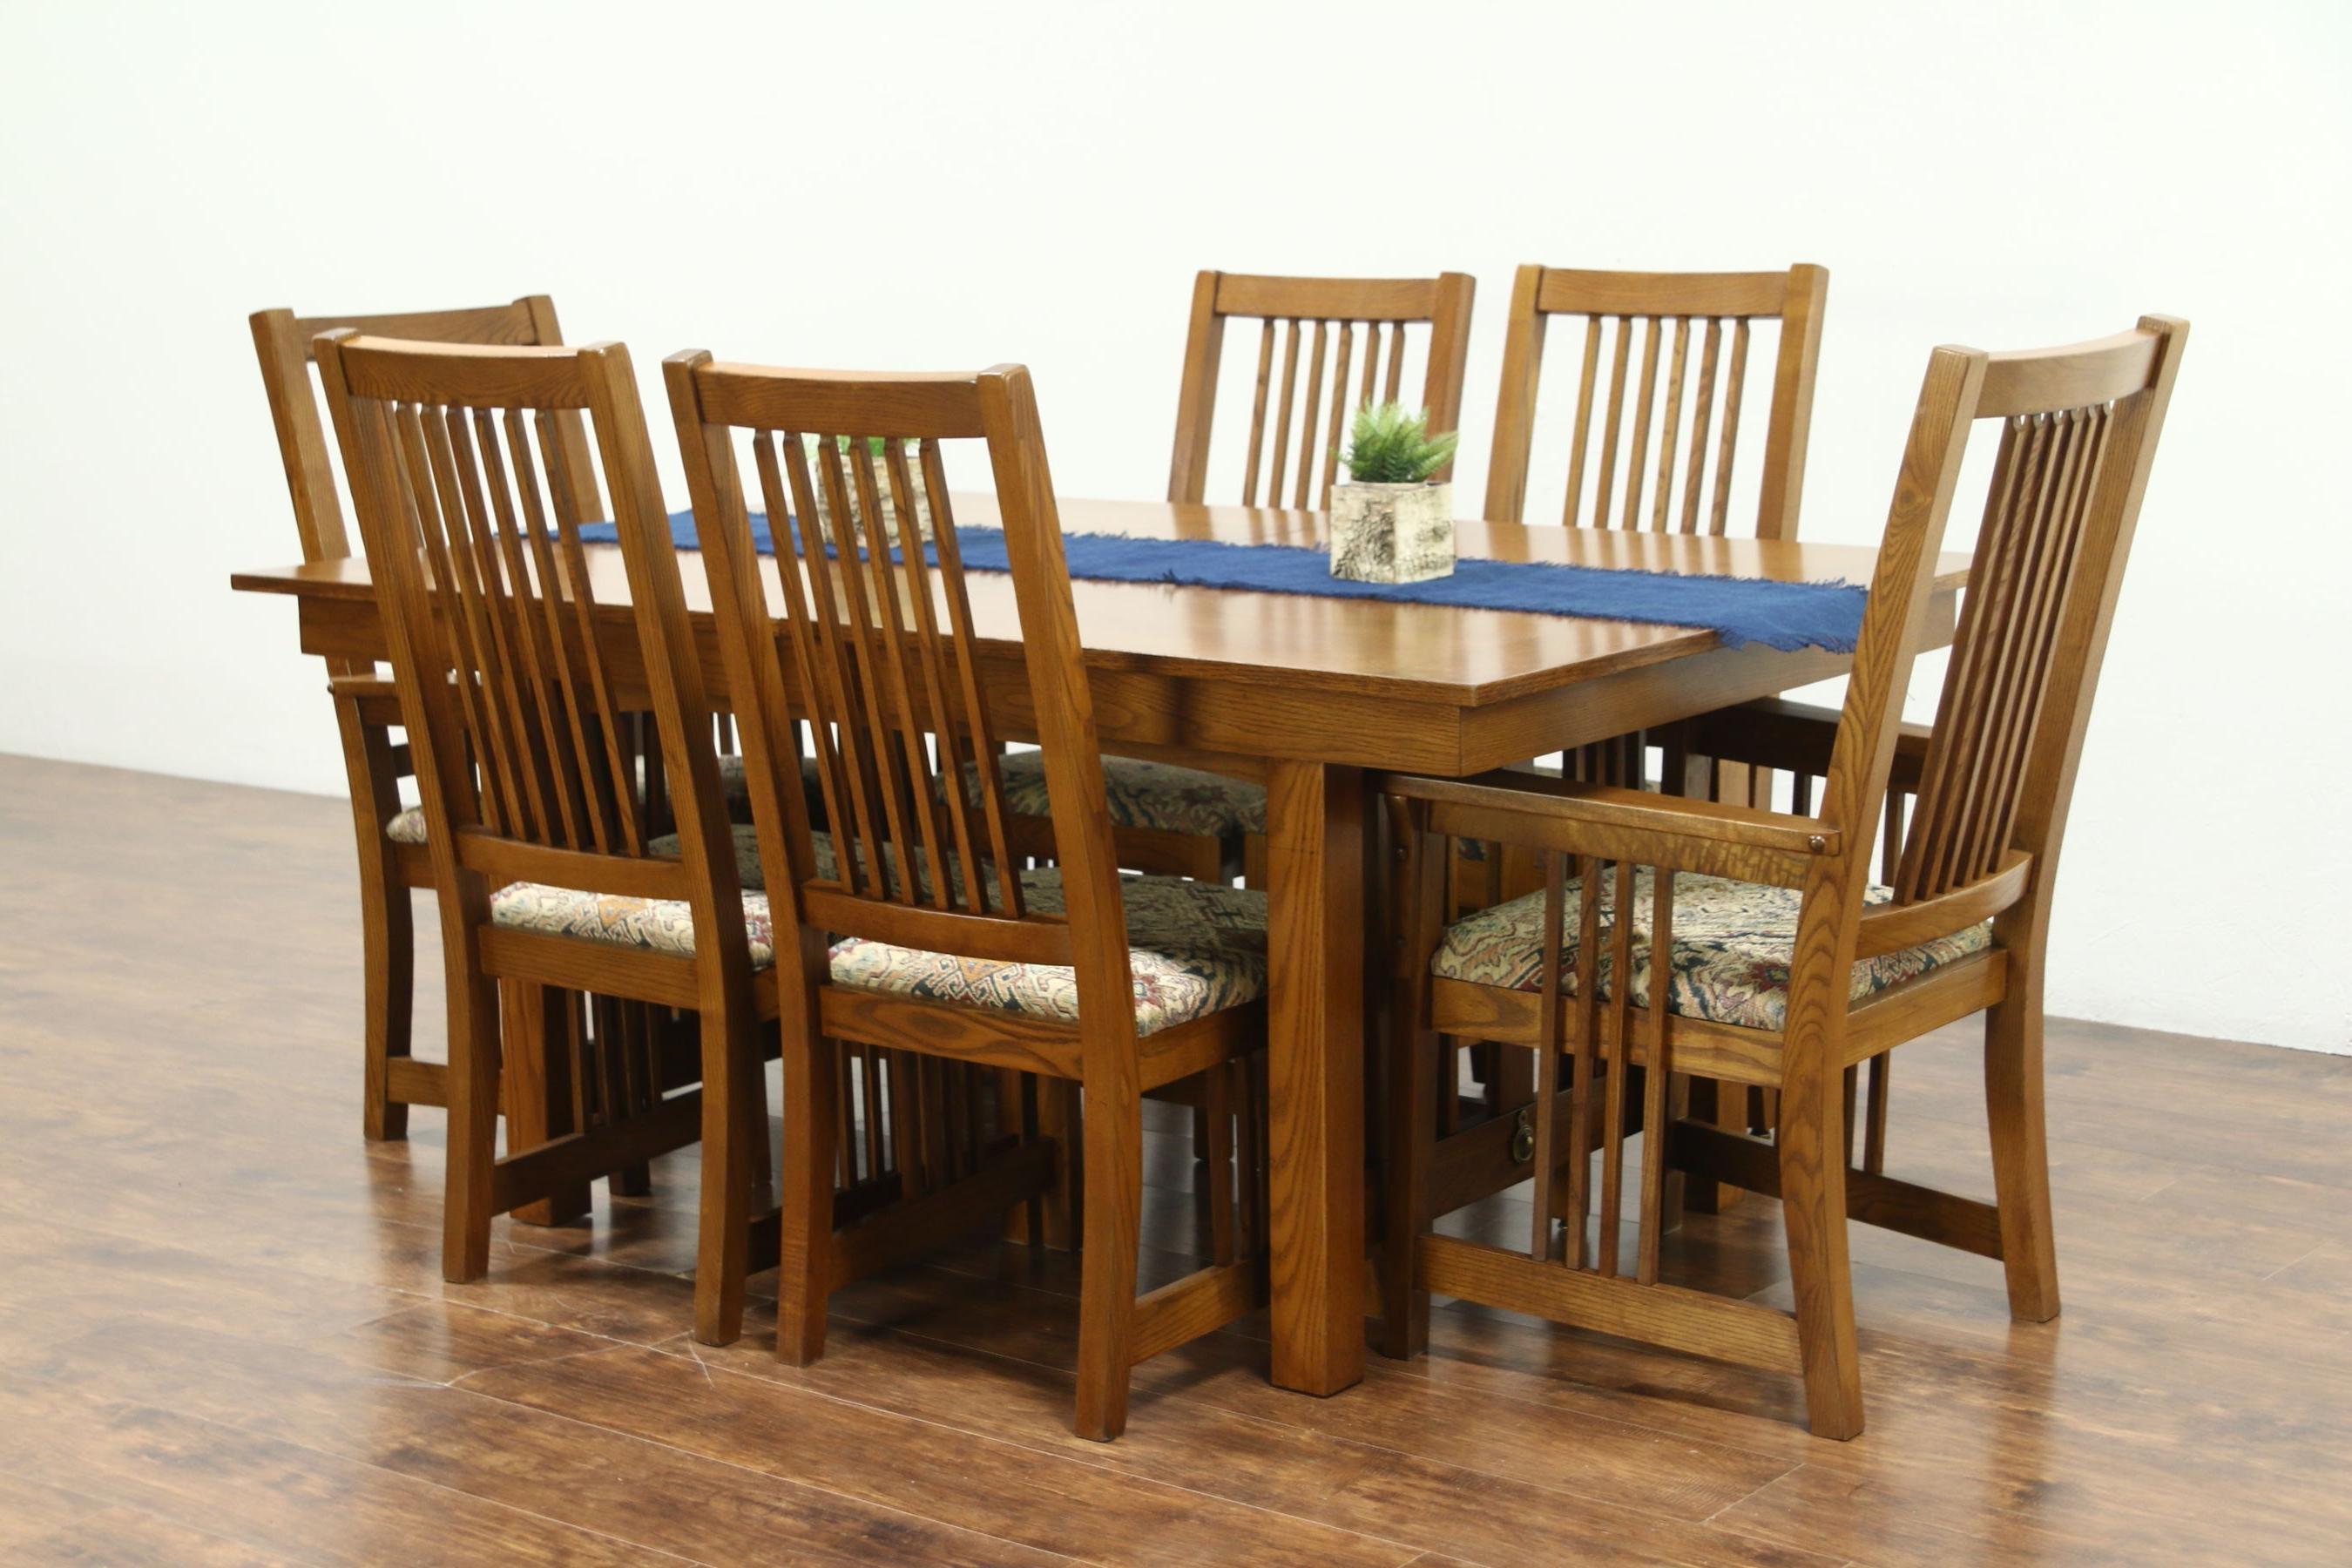 Sold – Prairie Or Craftsman Vintage Oak Dining Set, Table, 2 Leaves In Favorite Oak Dining Set 6 Chairs (View 14 of 25)